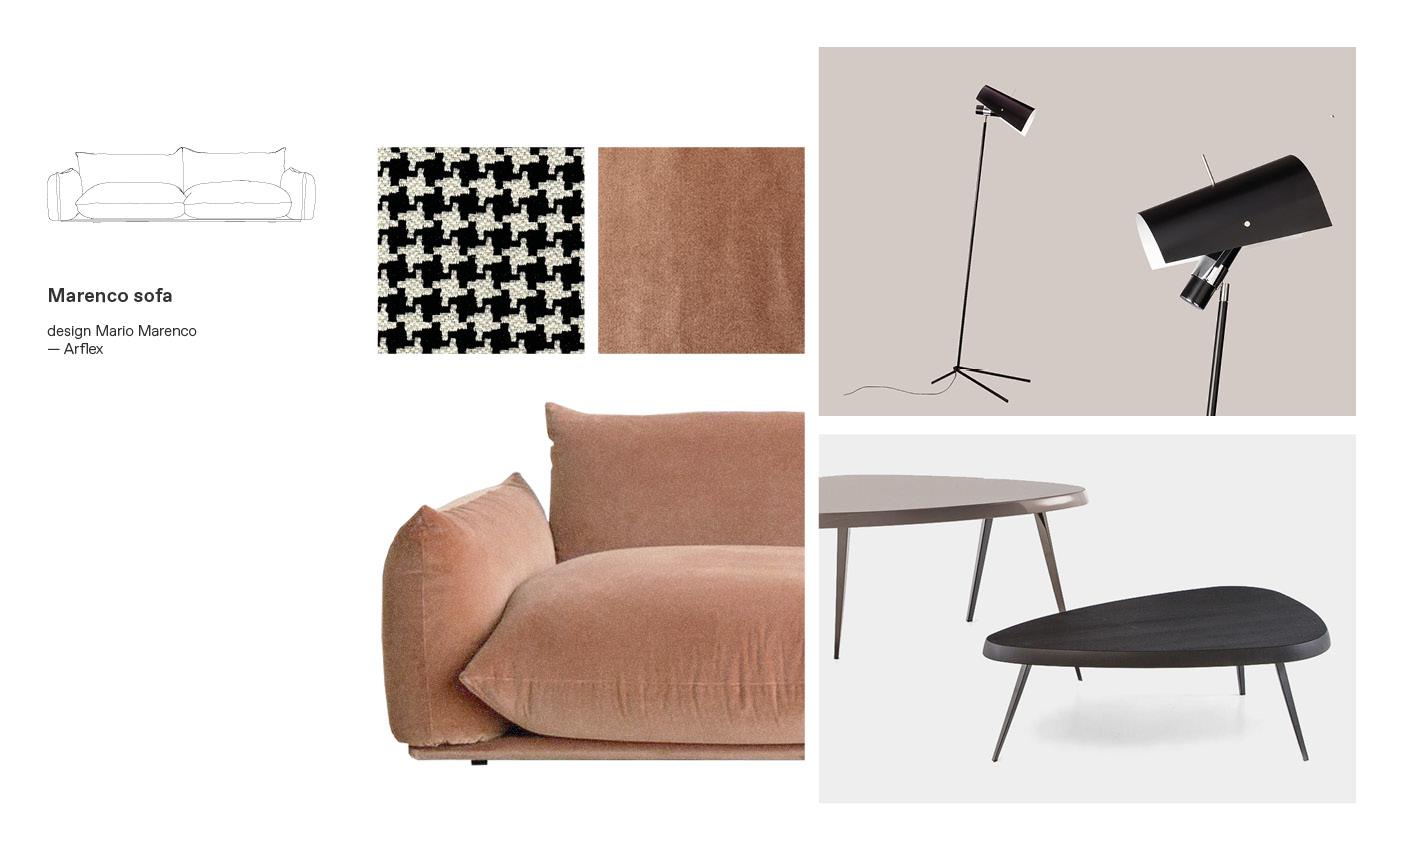 Marenco Arflex sofa moodboard composition